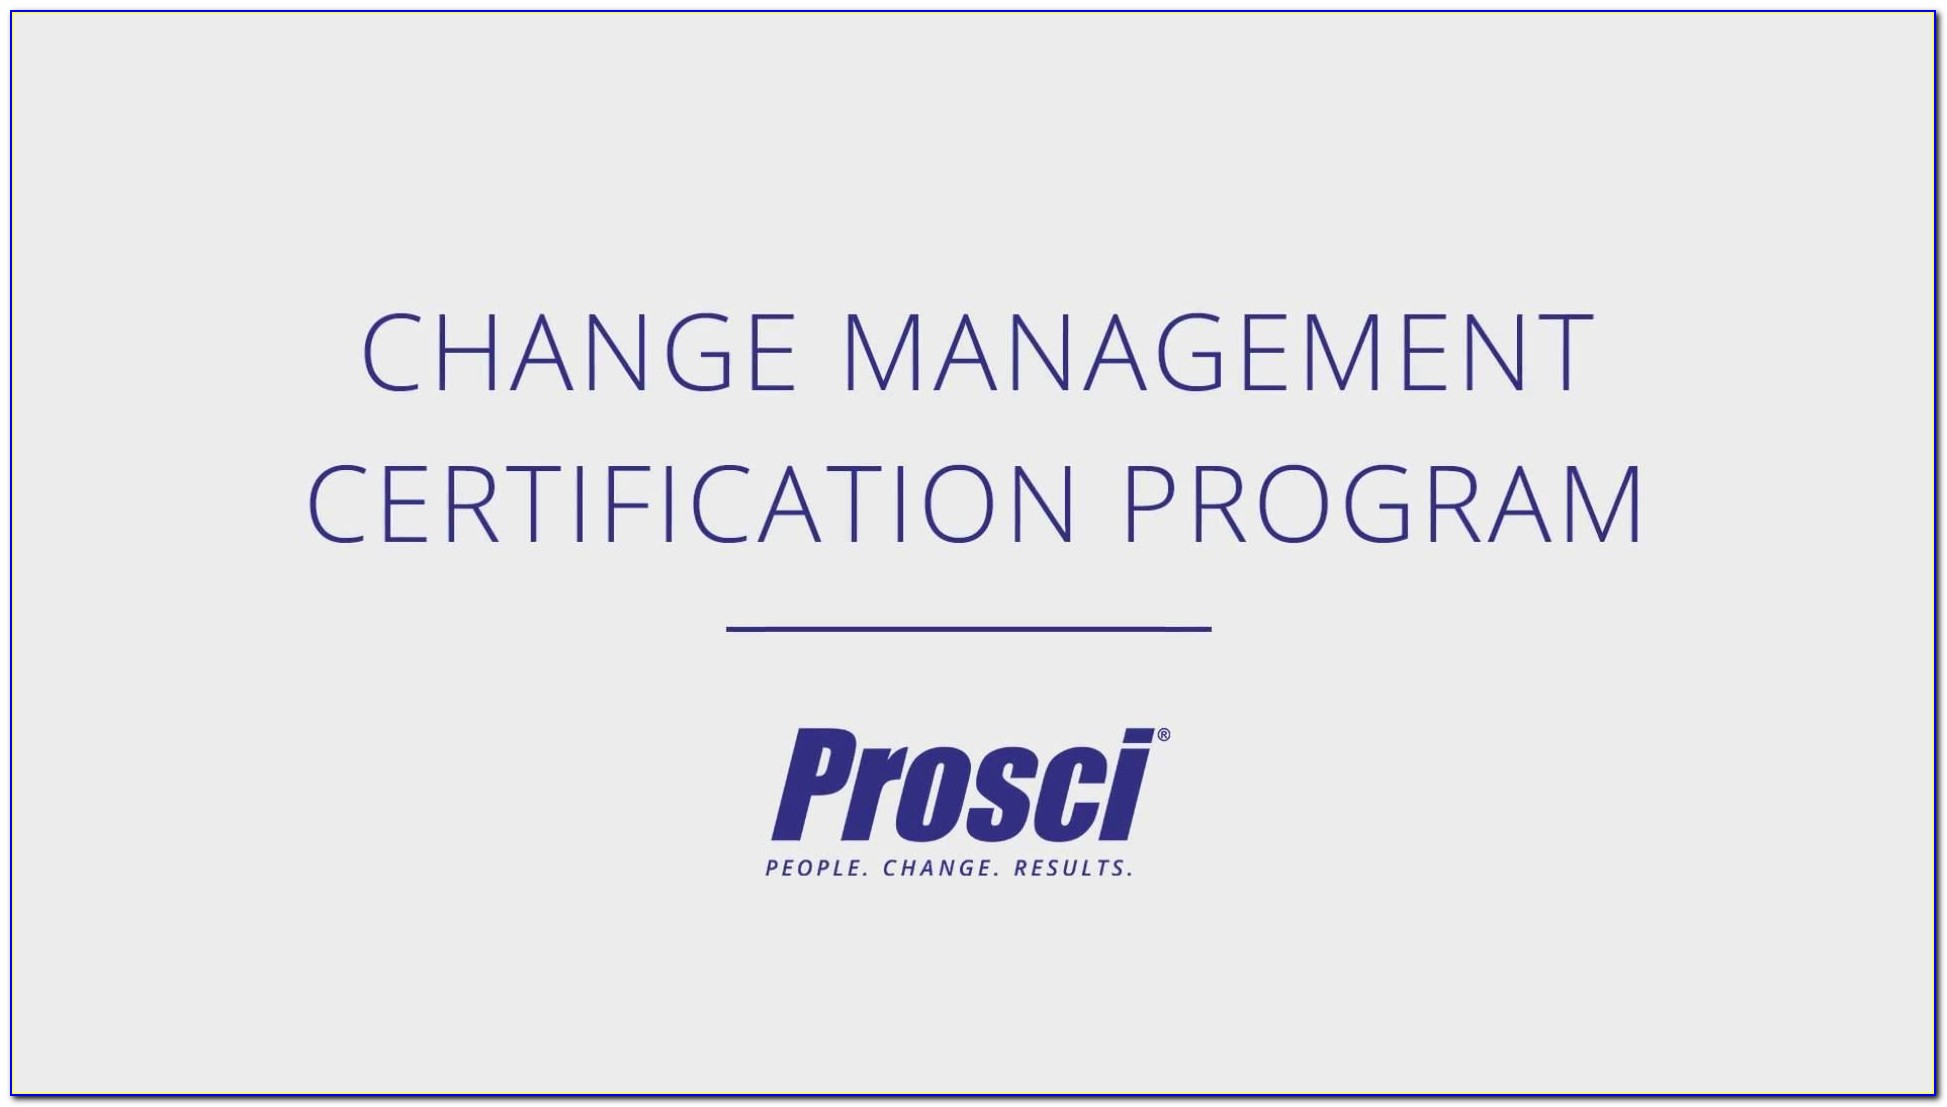 Prosci Change Management Certification Exam